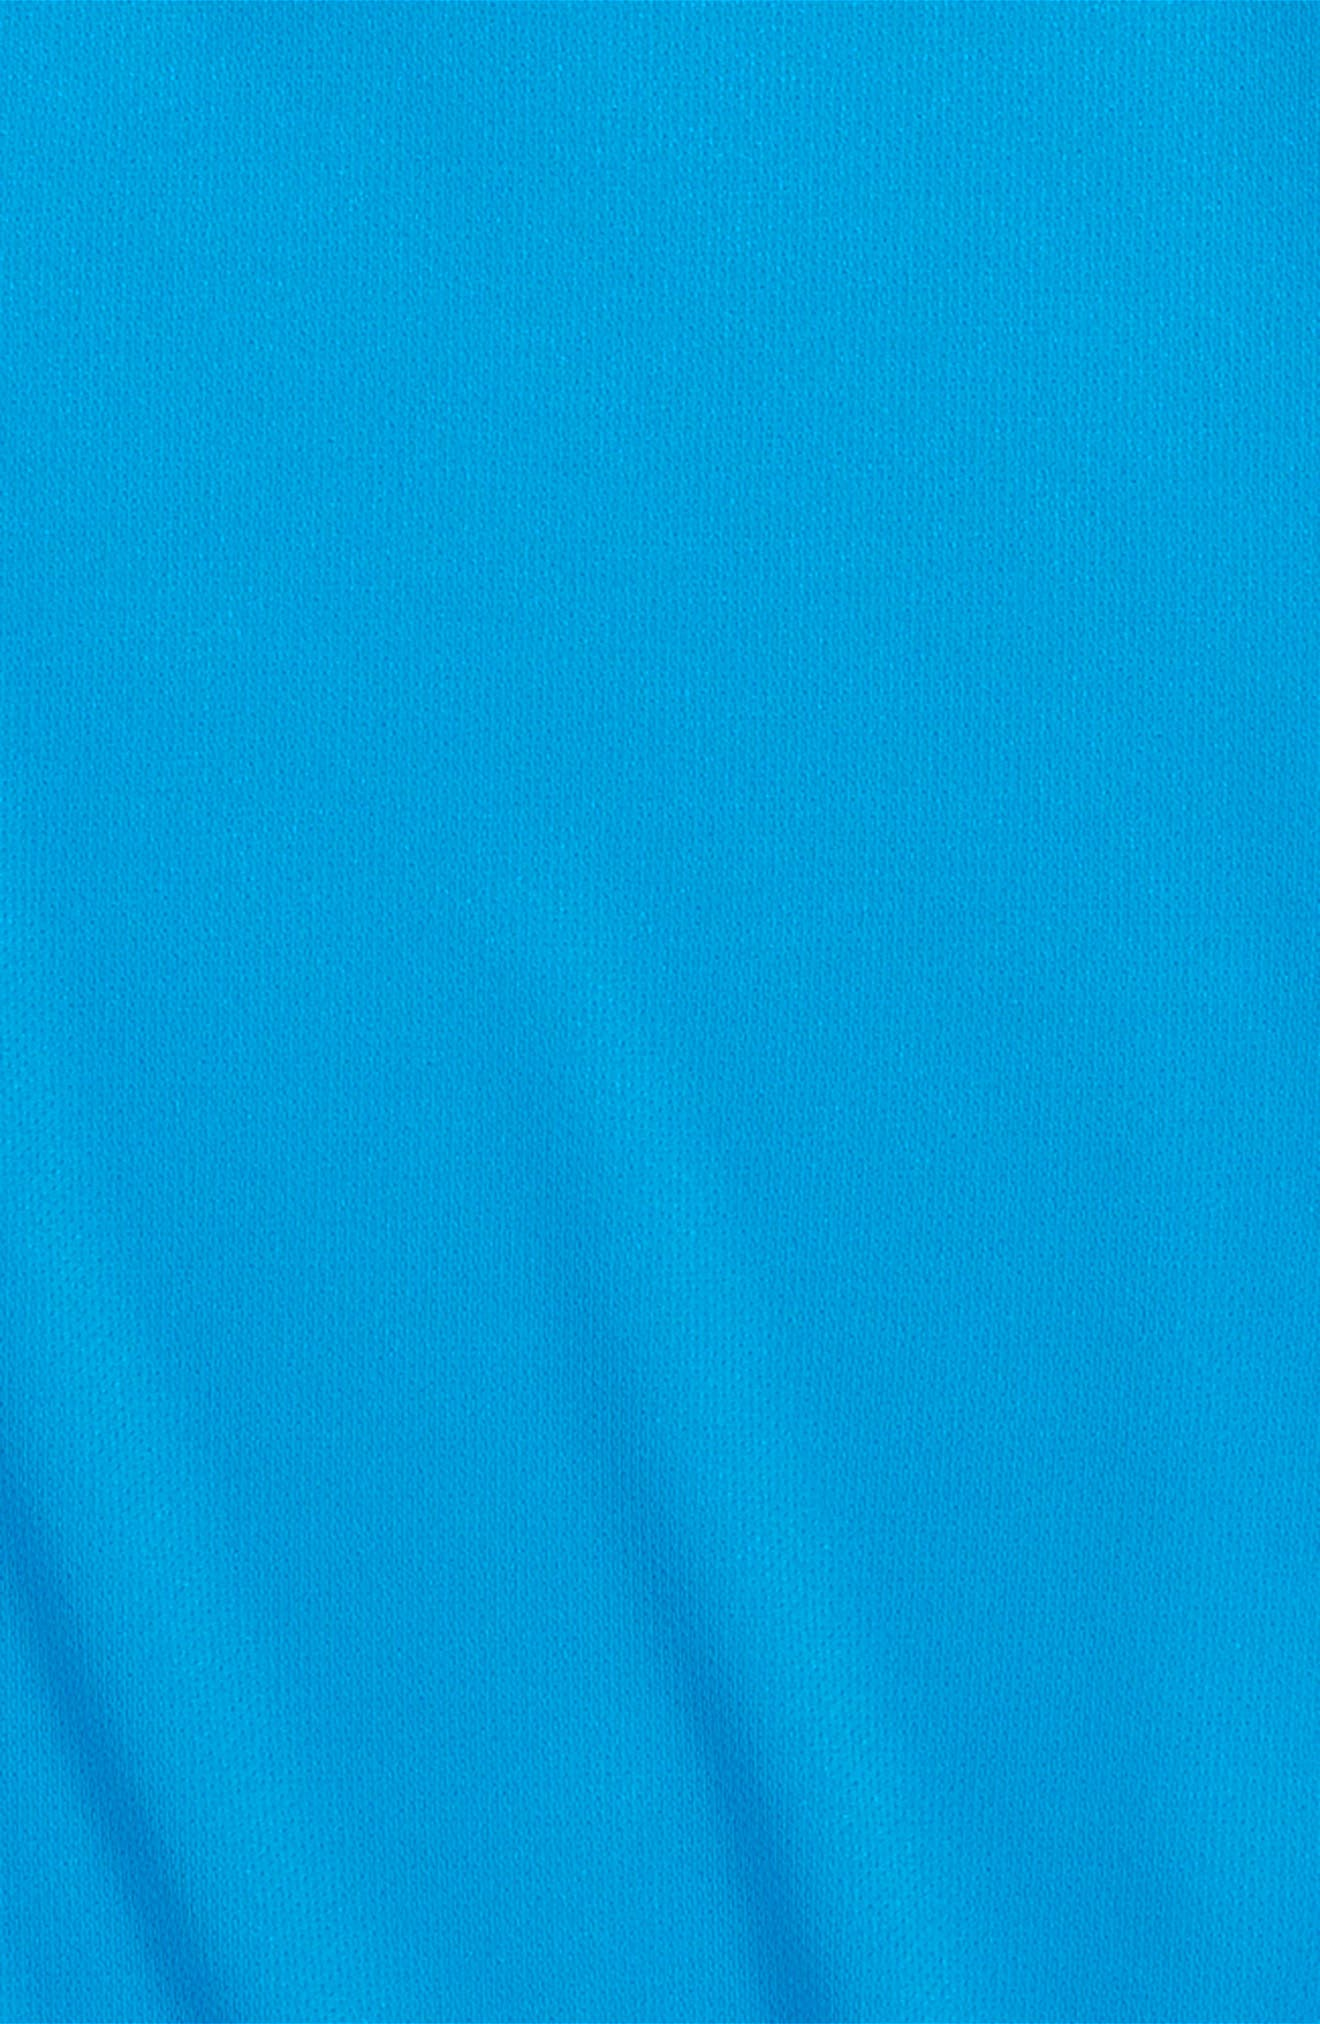 Dry Polo Shirt,                             Alternate thumbnail 2, color,                             Equator Blue/ White